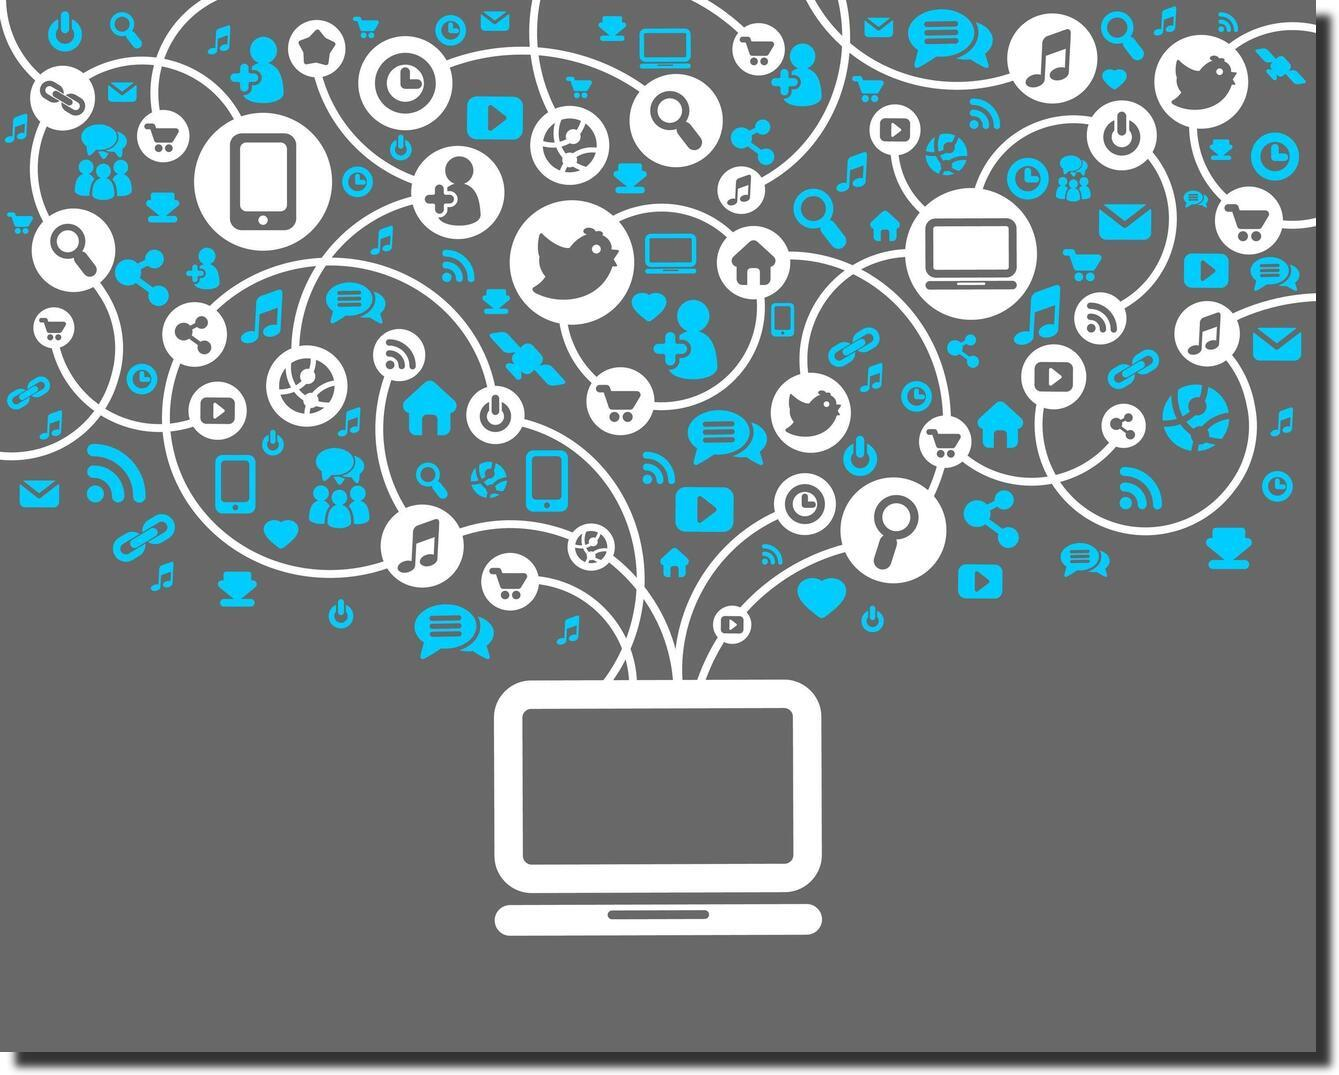 social networks image